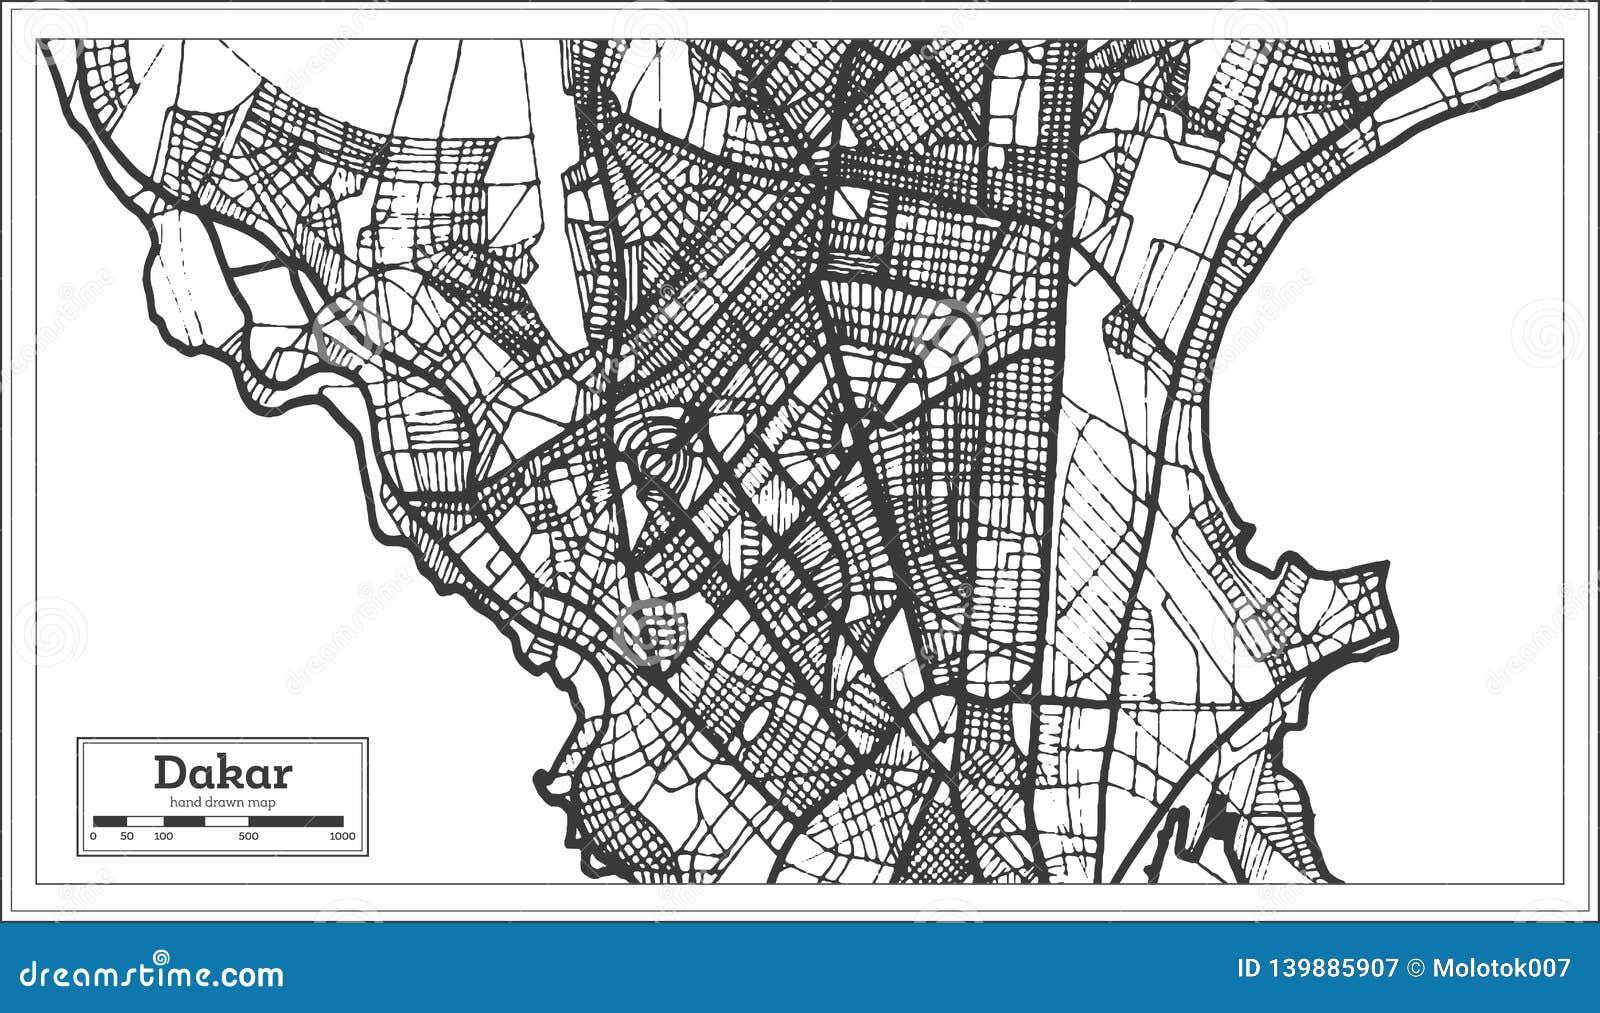 Dakar Senegal City Map In Retro Style. Outline Map Stock ... on abuja nigeria map, lusaka zambia map, johannesburg map, porto novo benin map, africa map, luanda angola map, sahara desert map, beijing china map, banjul gambia map, lagos nigeria map, nairobi kenya map, abidjan ivory coast map, diourbel senegal map, cape verde map, malabo equatorial guinea map, moscow russia map, yaounde cameroon map, warsaw poland map, cairo egypt map, ouagadougou burkina faso map,